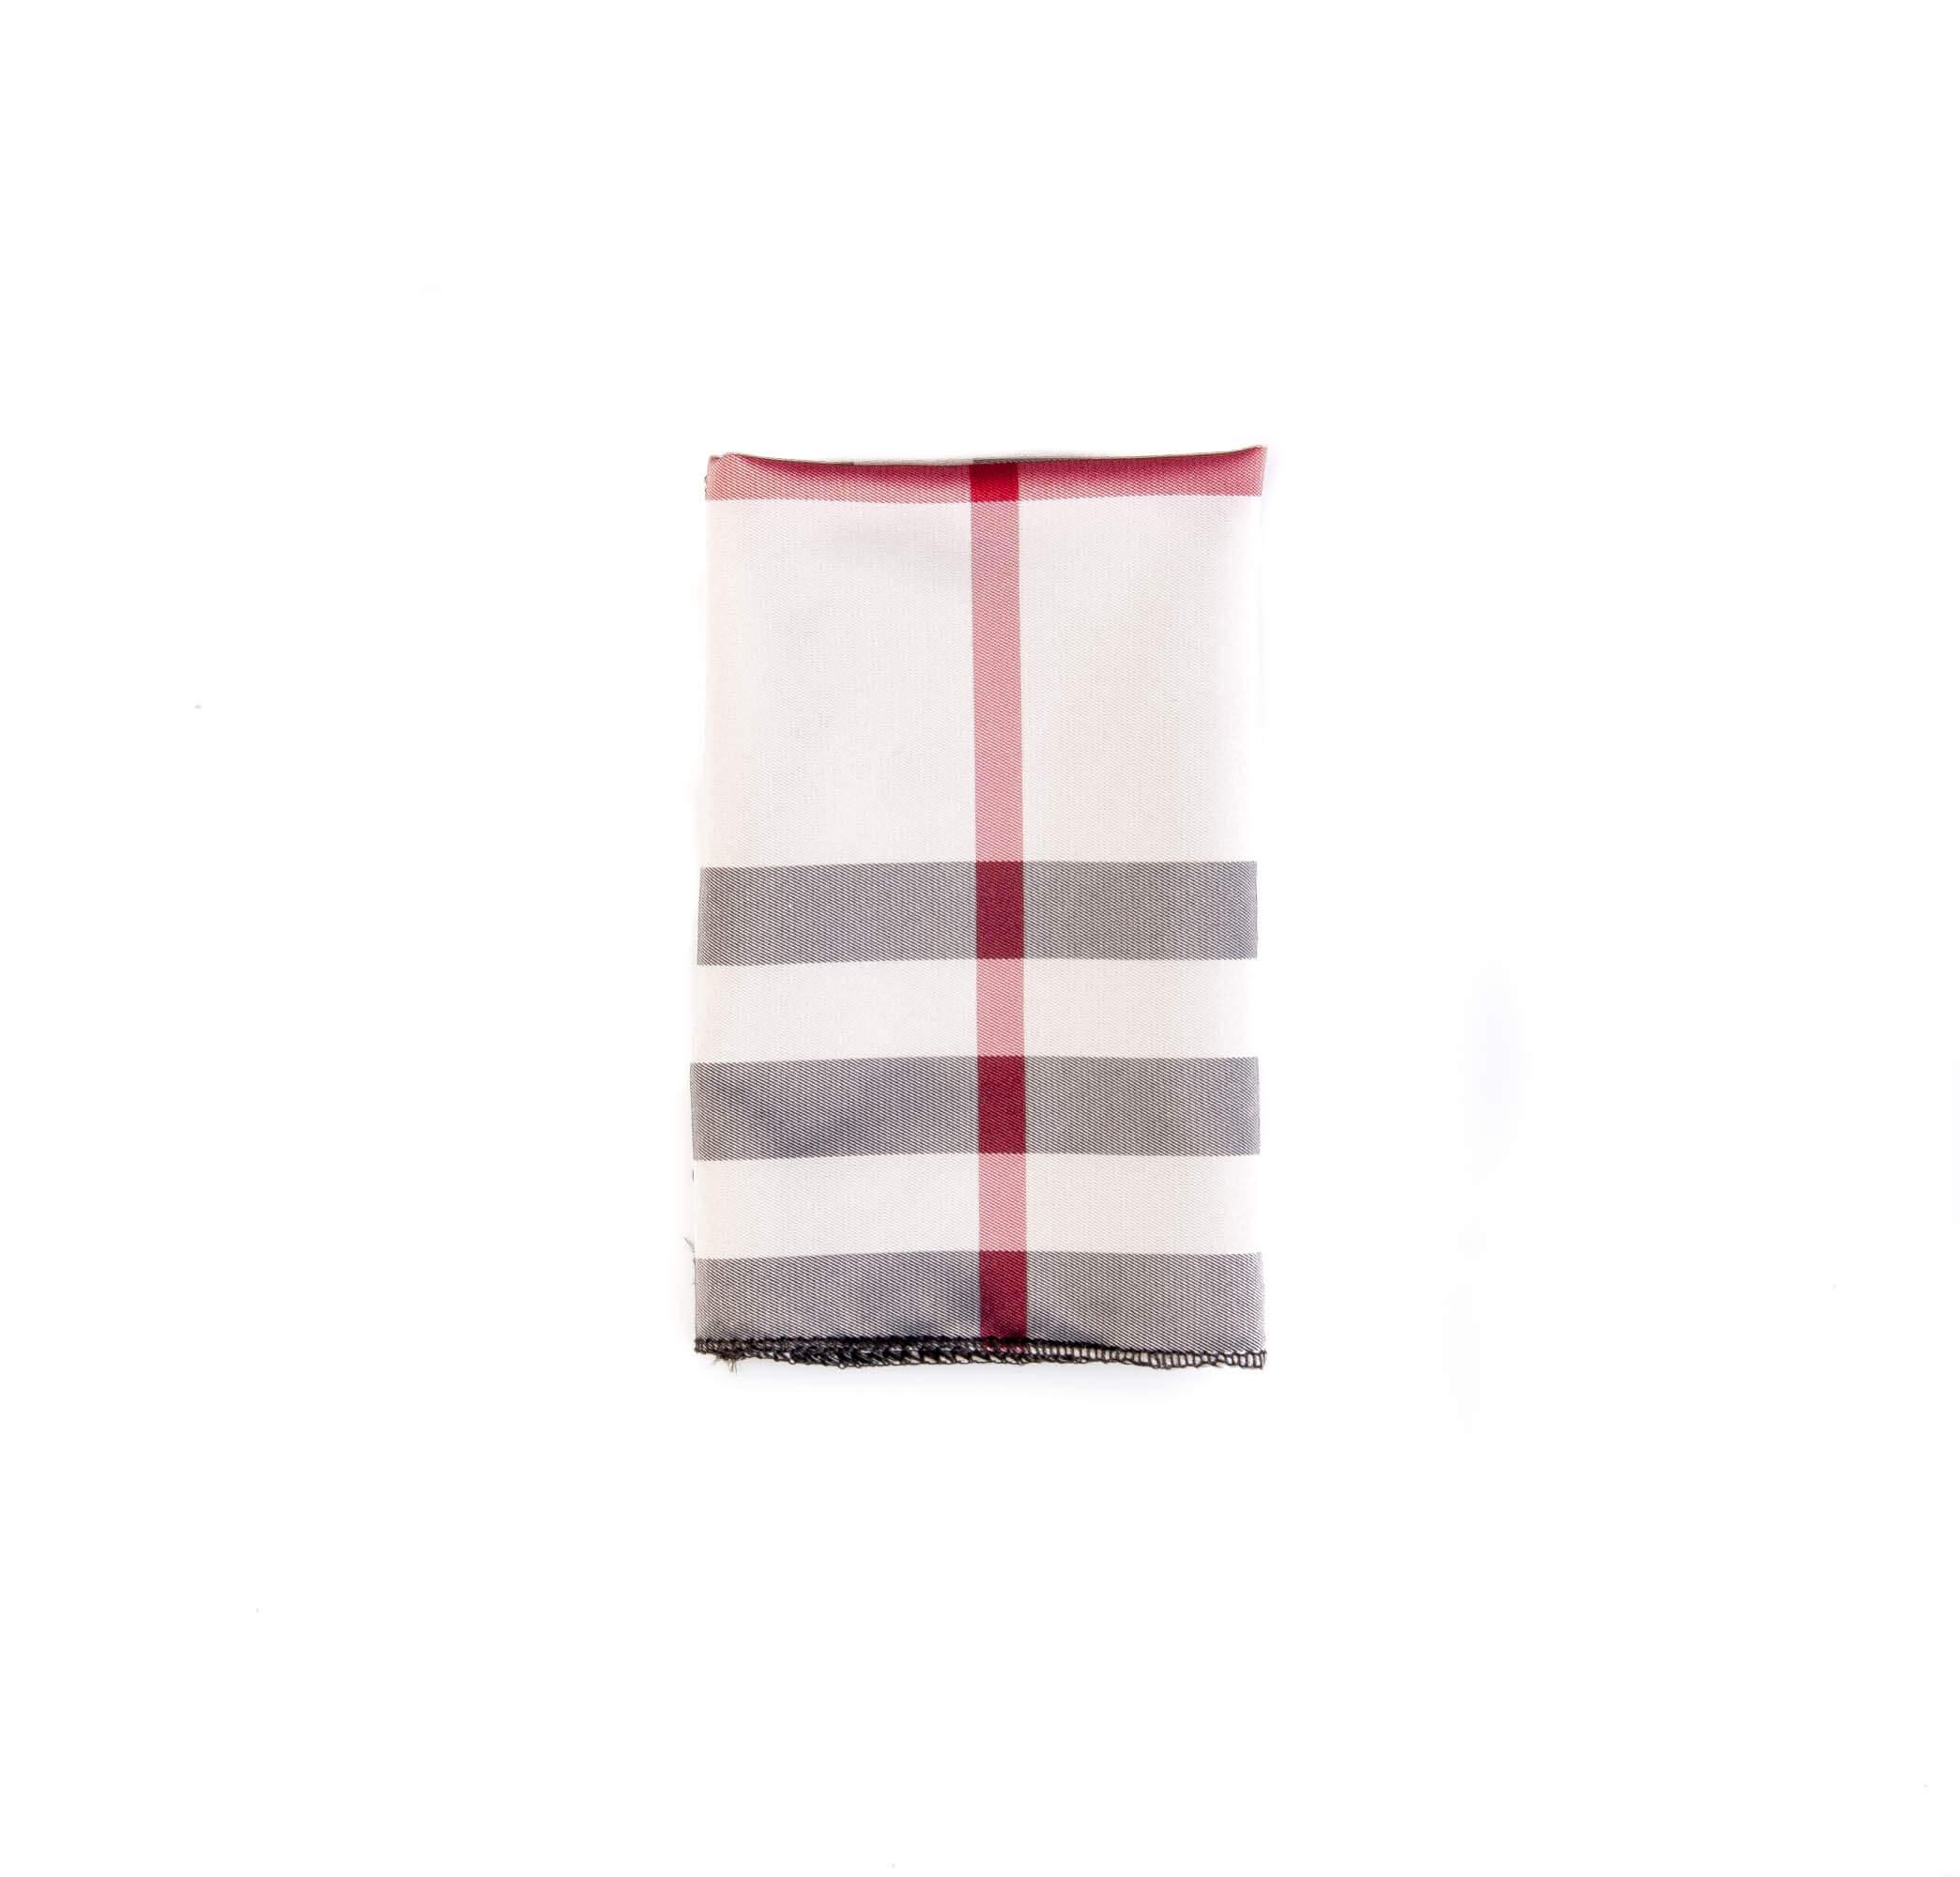 دستمال جیب طرح دار کد PS1058